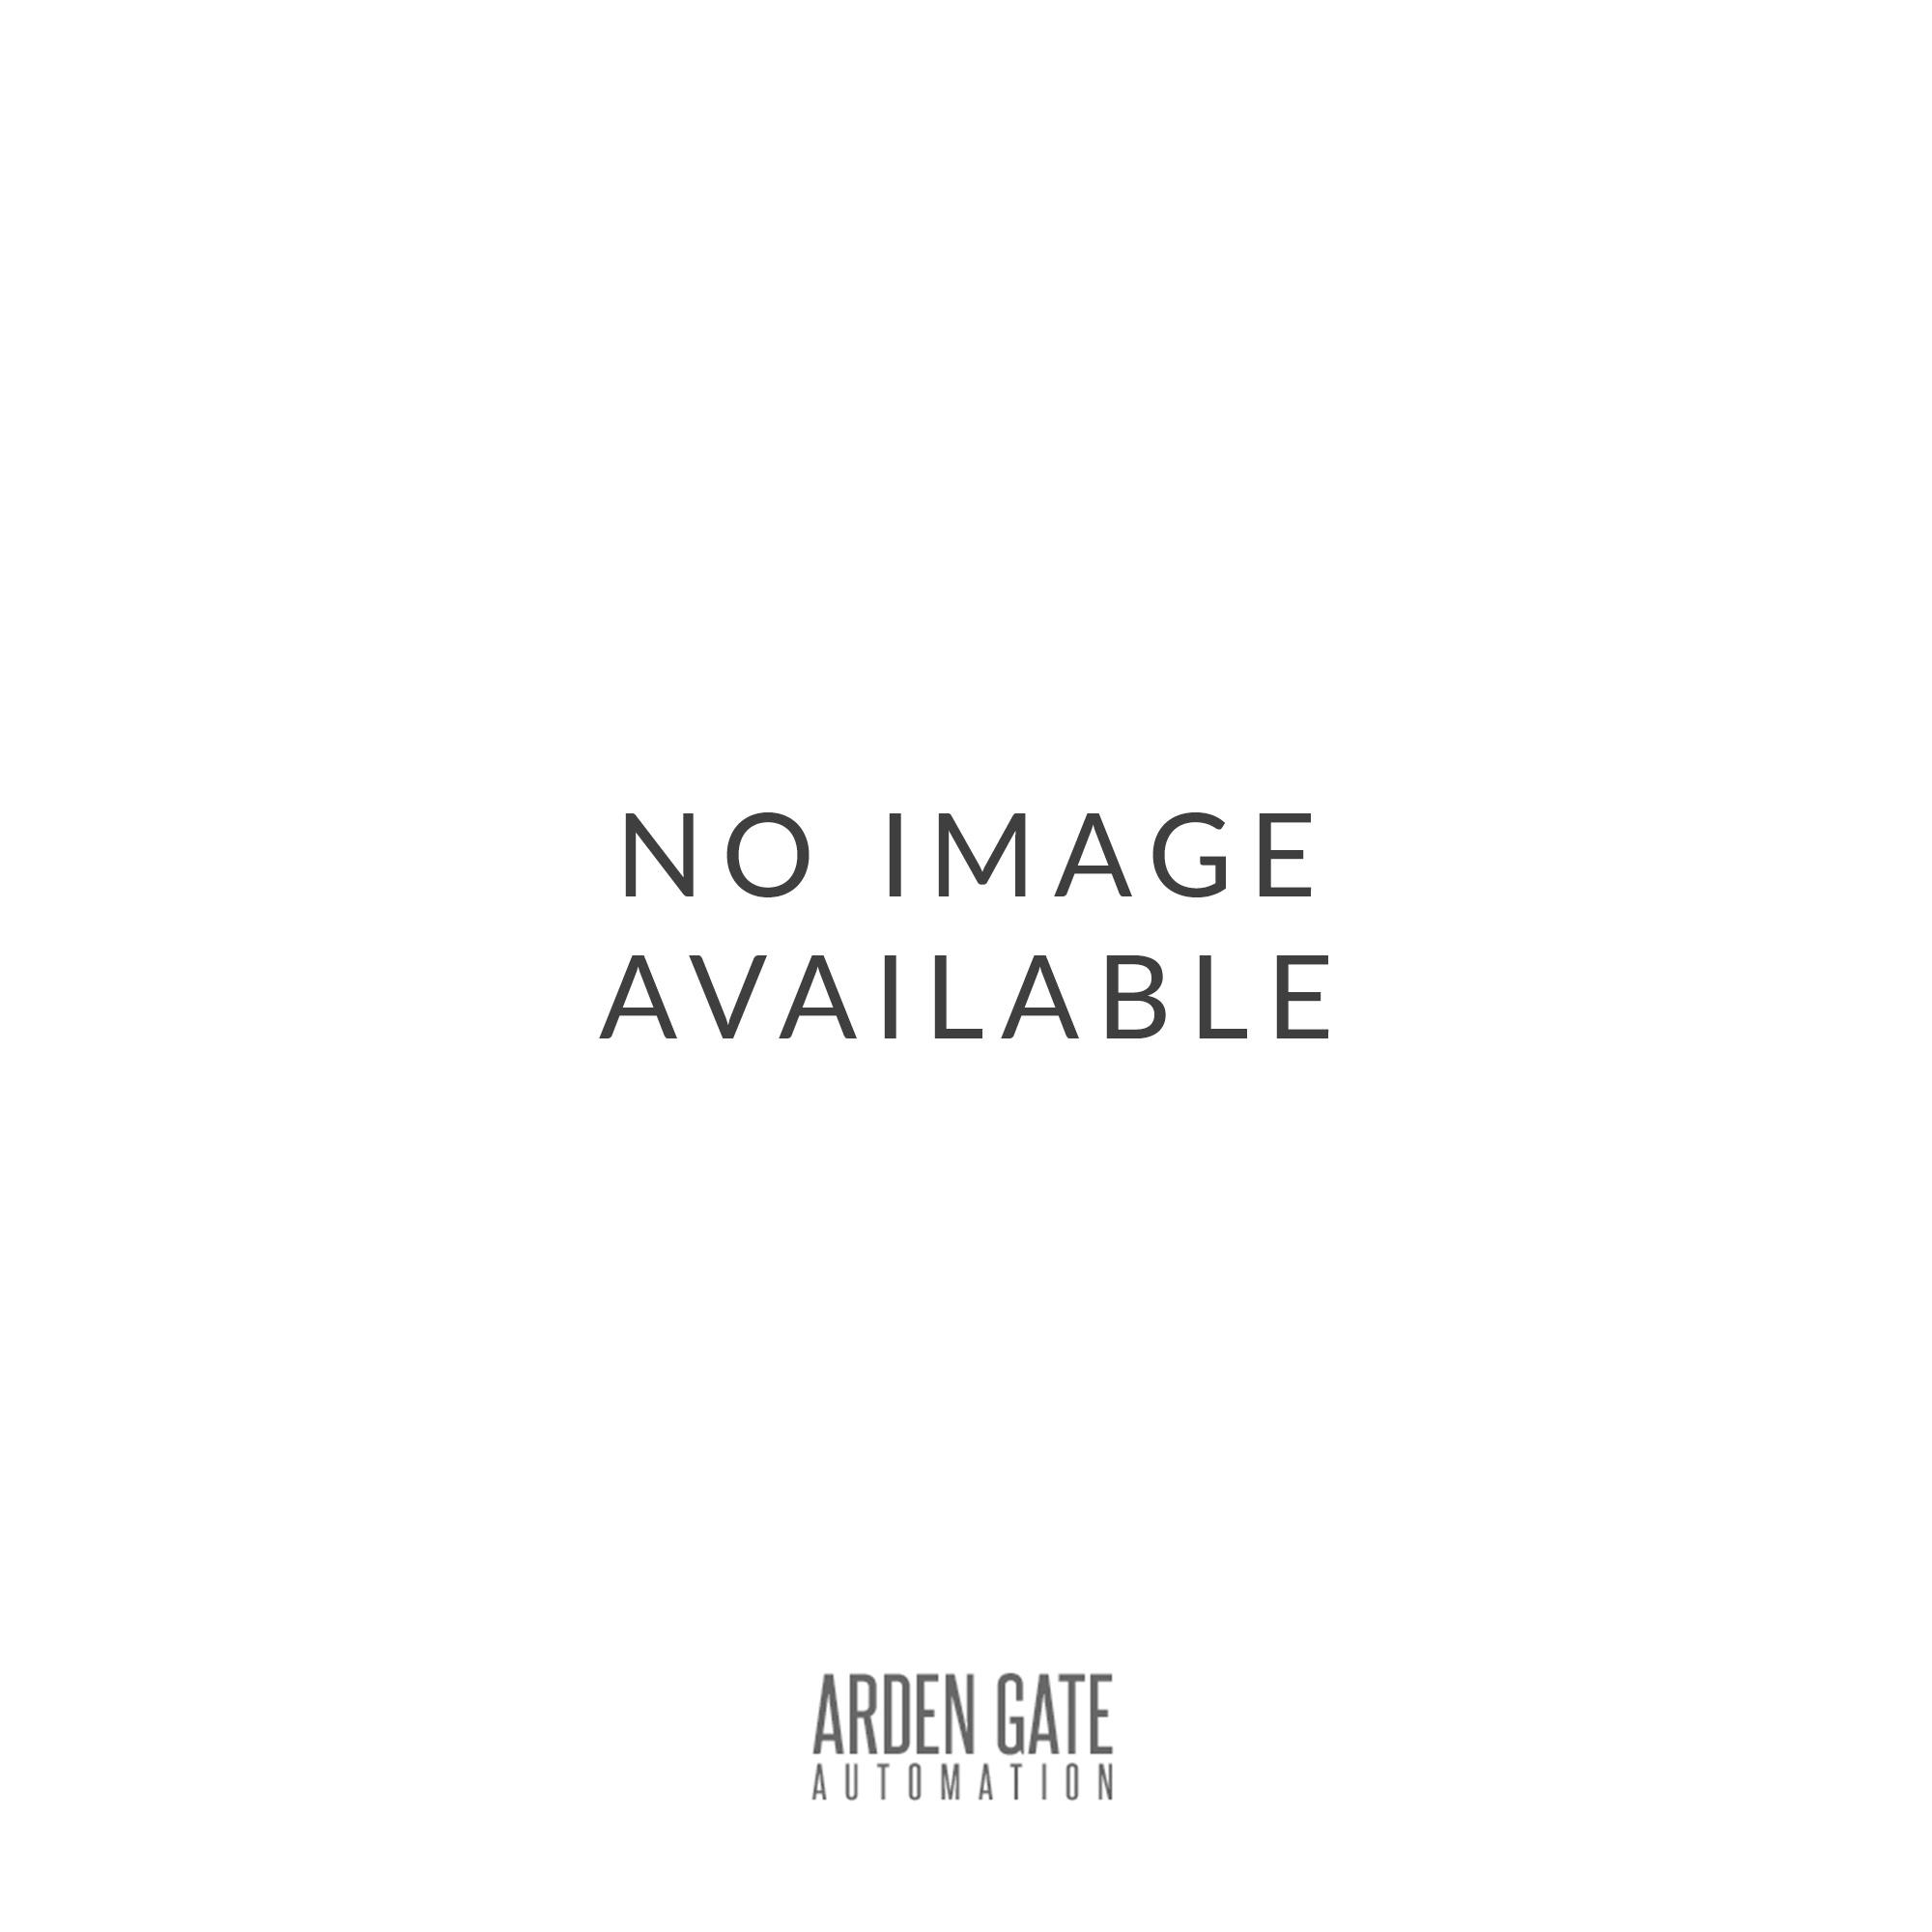 FAAC 415 L LS 24v KIT S electro mechanical operator single long limit switch kit for swing gates